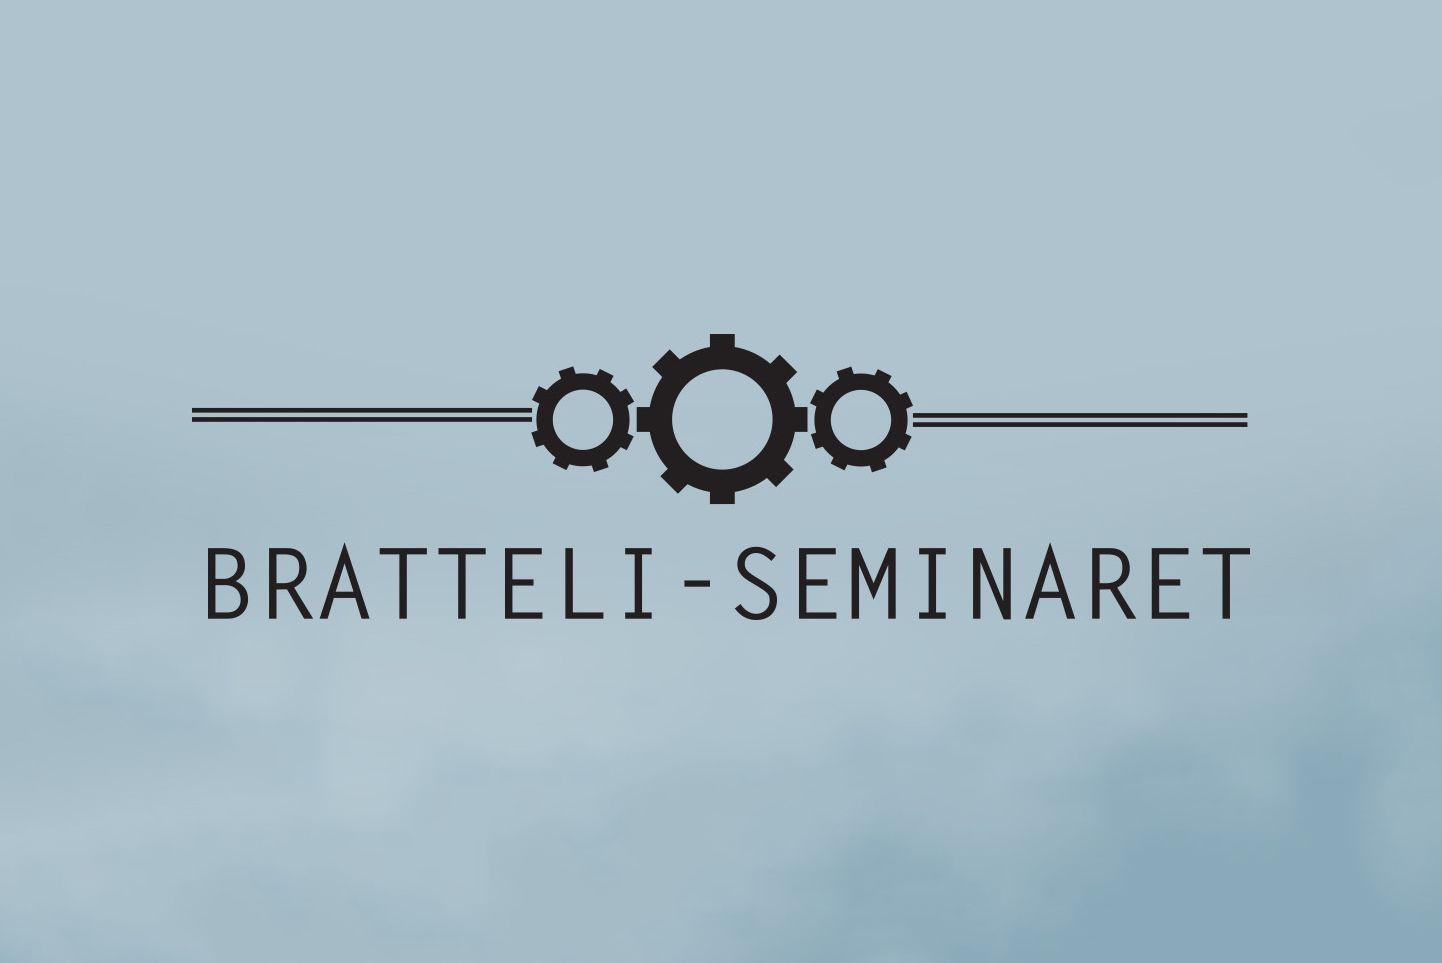 Bratteli-seminaret